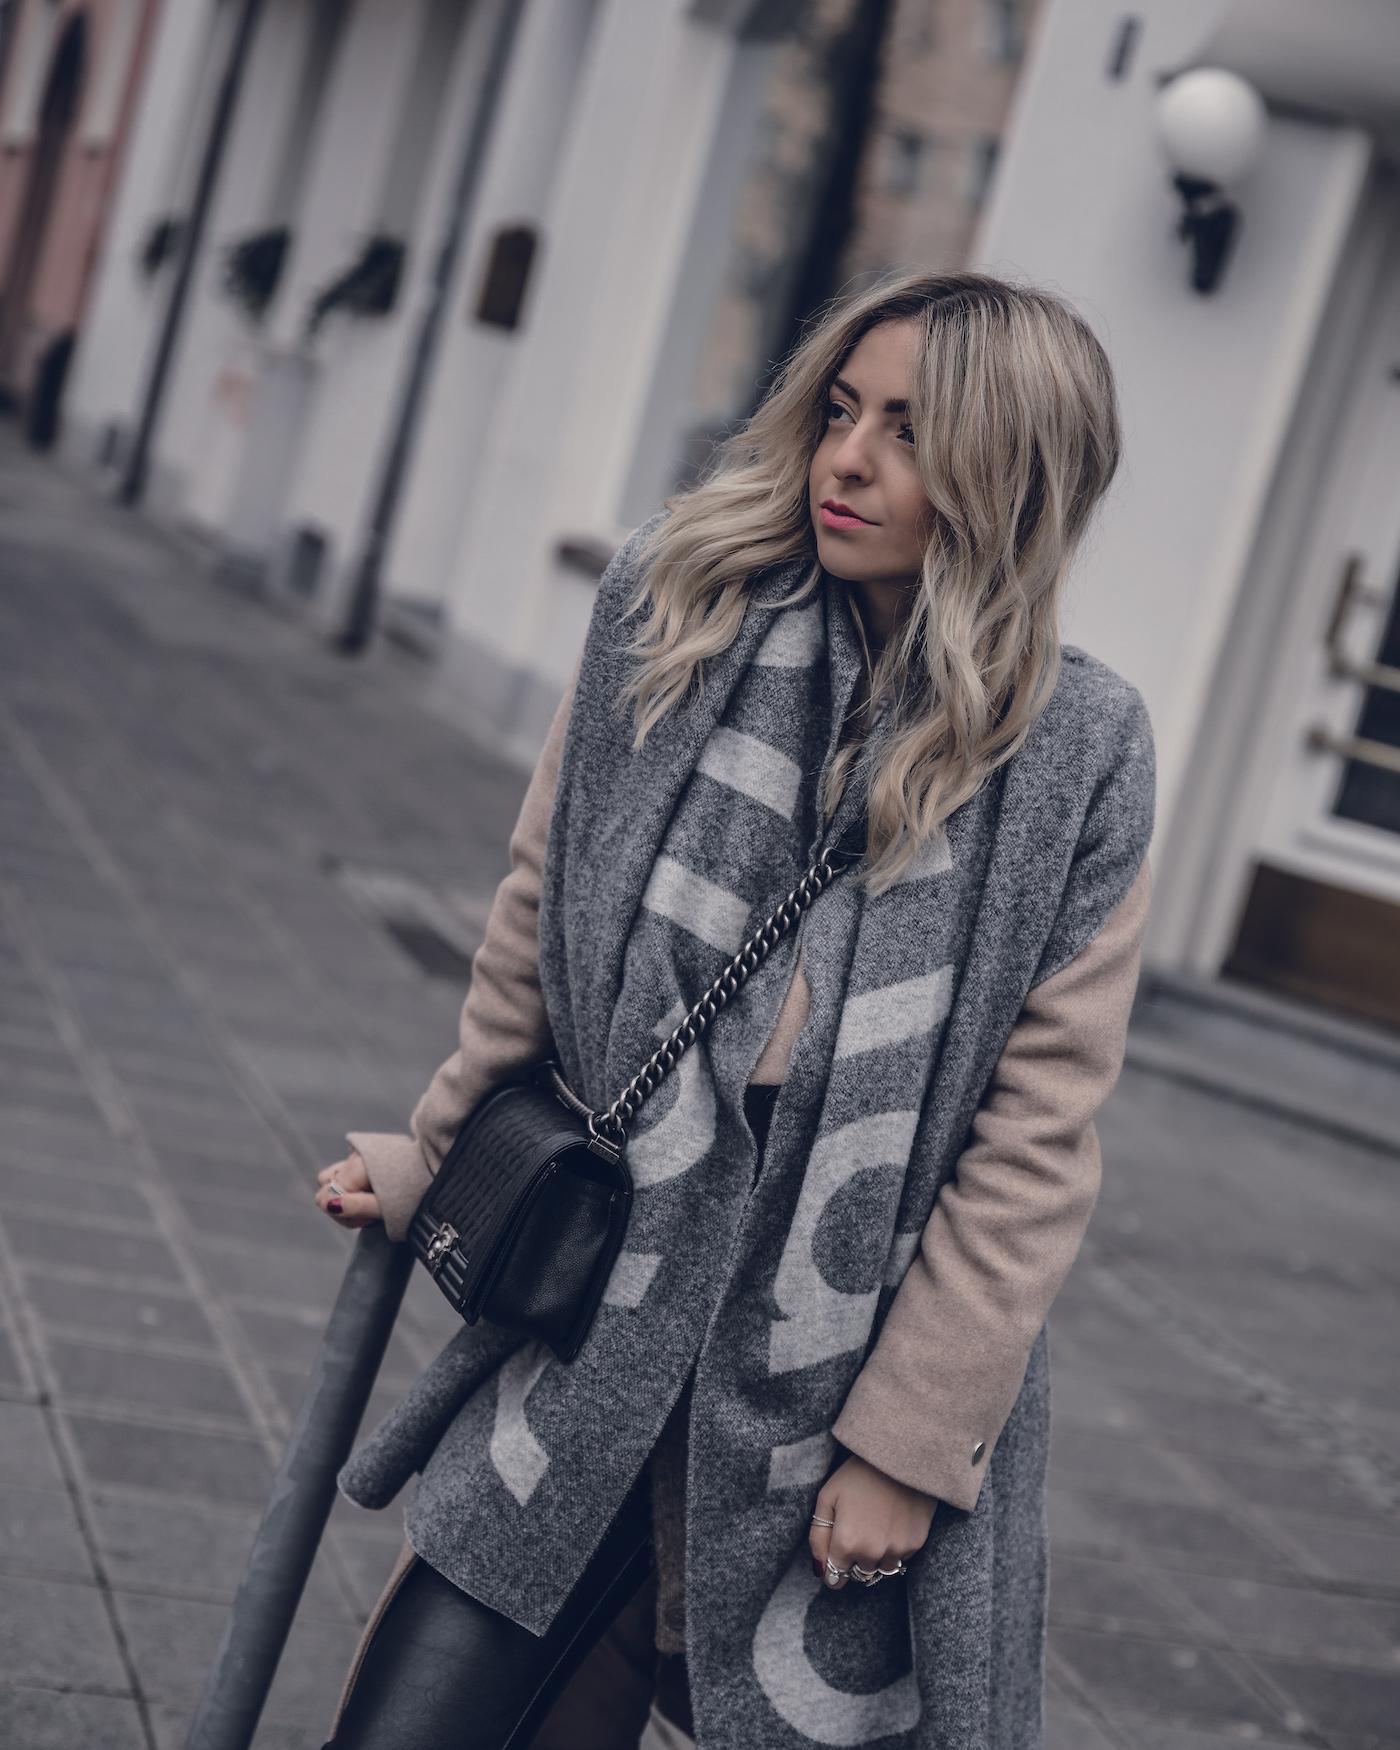 3b12d73c5df6 Acne-Studios-Scarf-Toronto-Review-WantGetRepeat-Fashion-Blog-01 ...